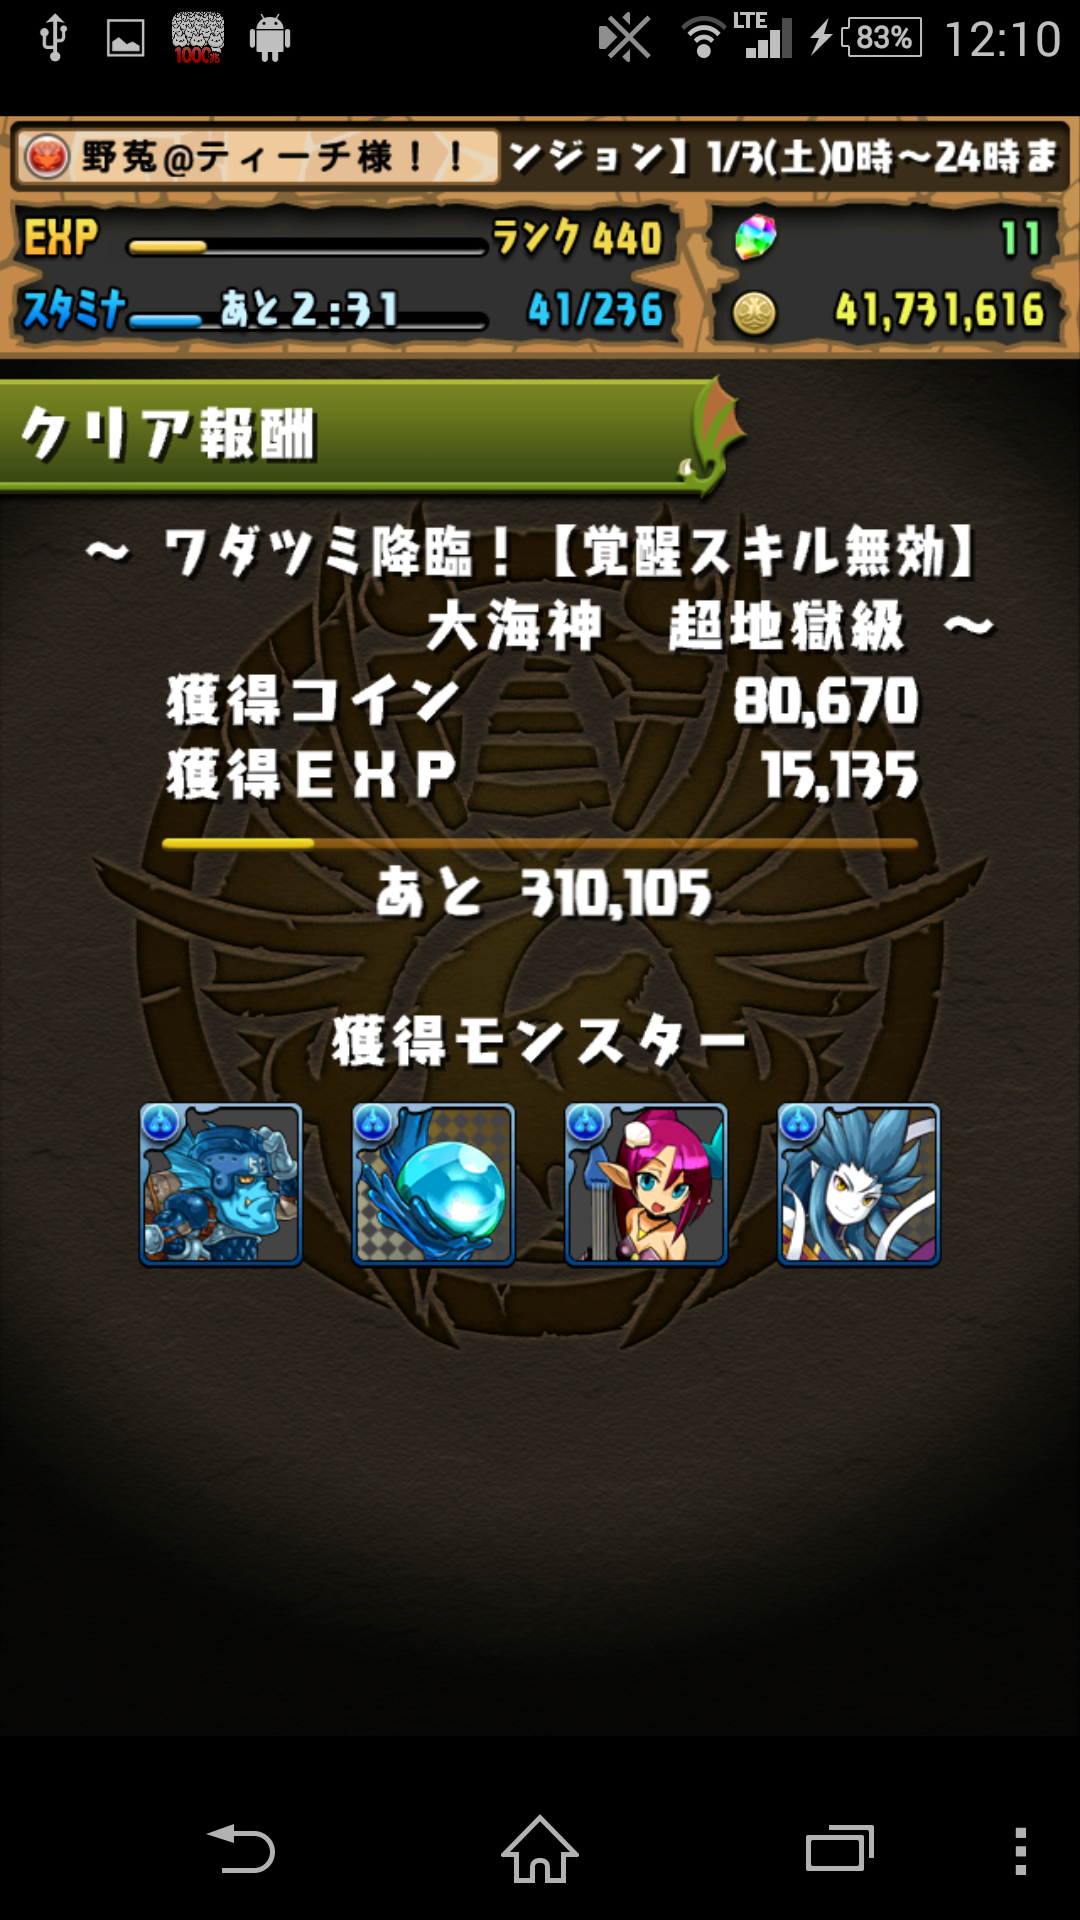 Screenshot_2015-01-03-12-10-22.png